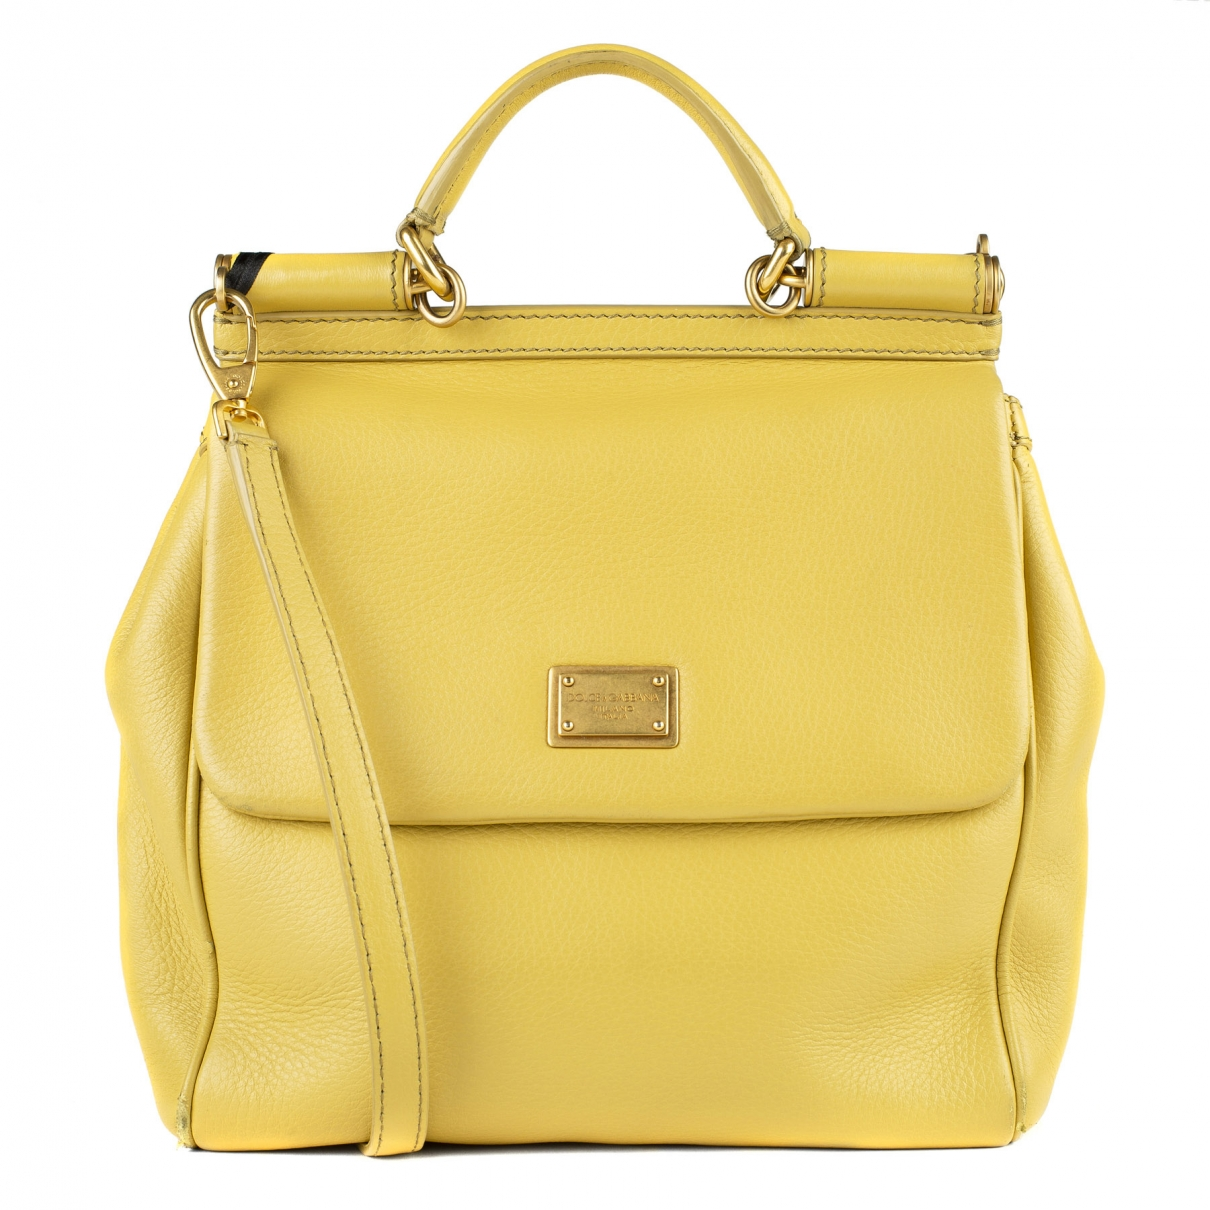 Dolce & Gabbana - Sac a main Sicily pour femme en cuir - jaune